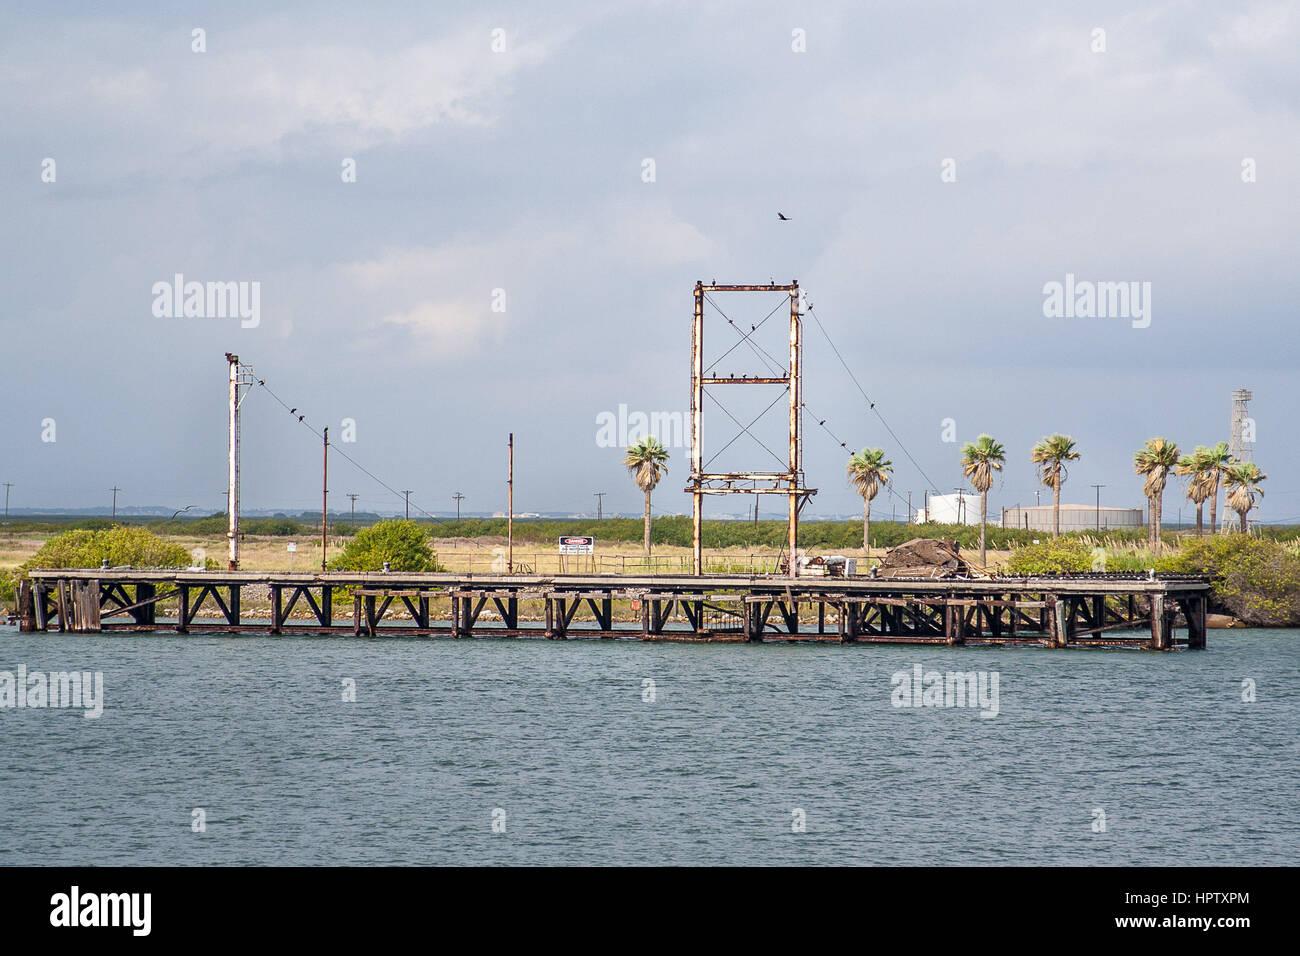 Industrial area across from Robert's Point Park in Port Aransas, Texas - Stock Image